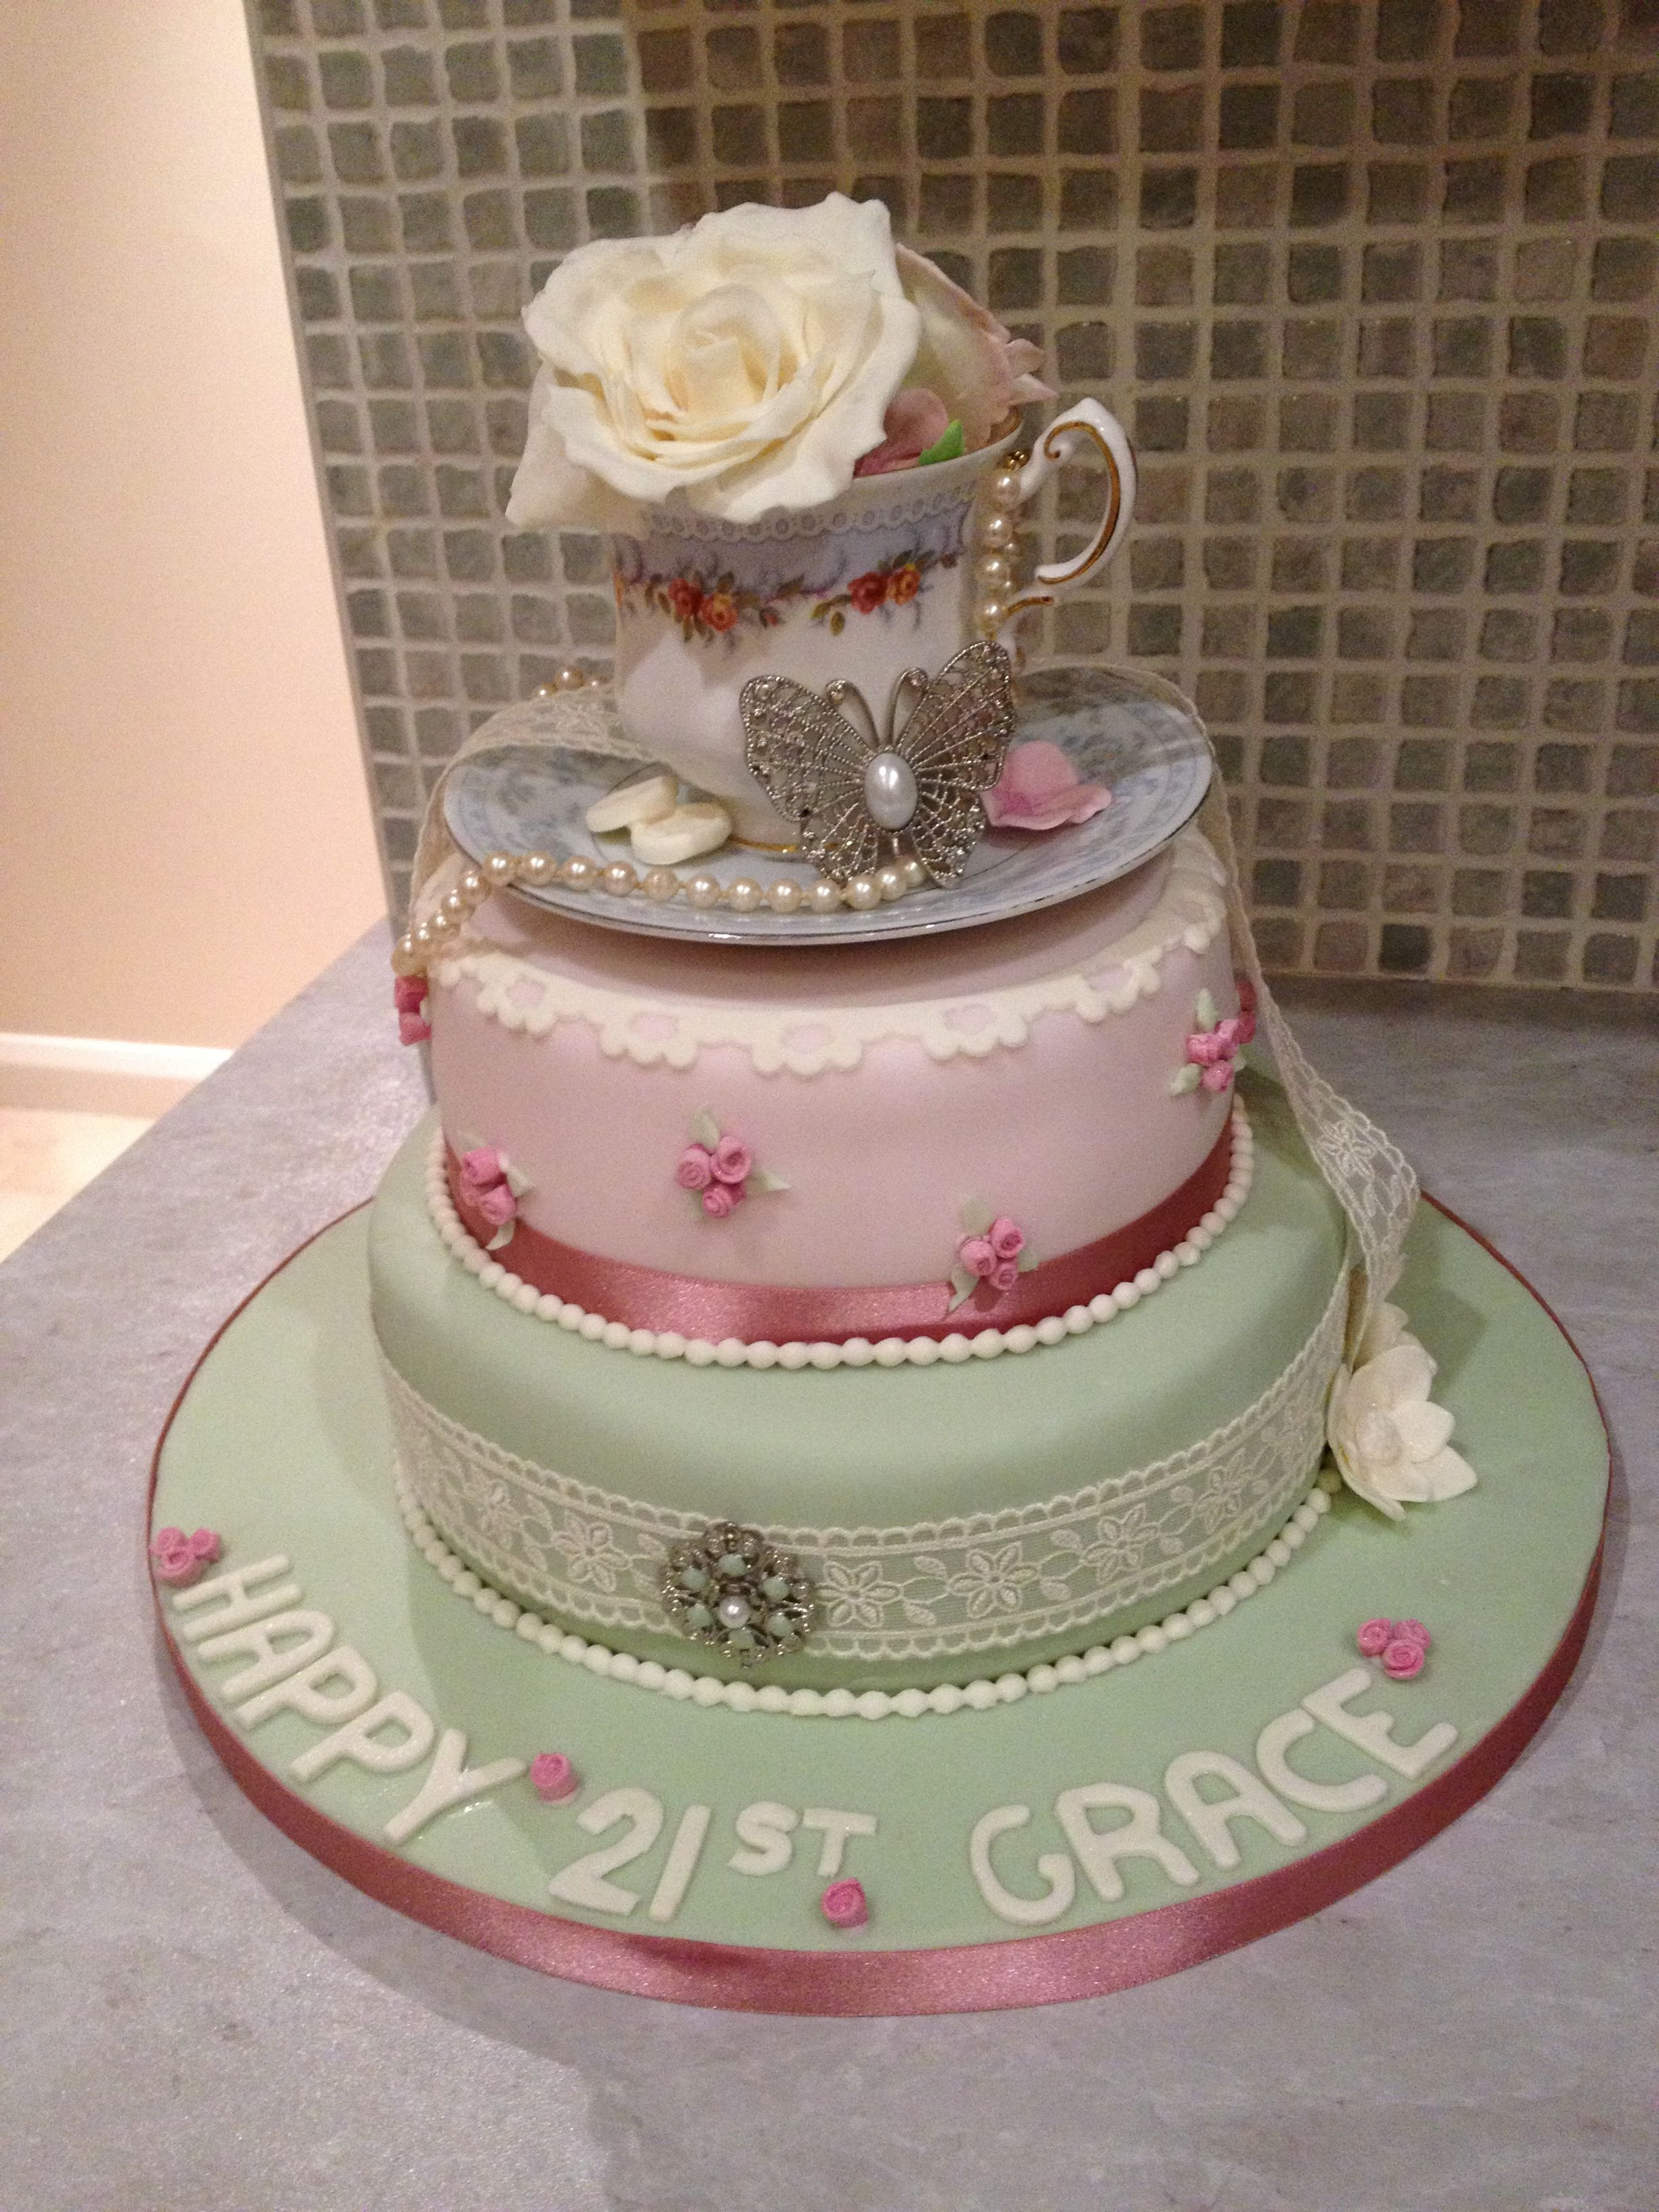 Stupendous Vintage 21St Birthday Cake With Images 21St Birthday Cake Personalised Birthday Cards Arneslily Jamesorg